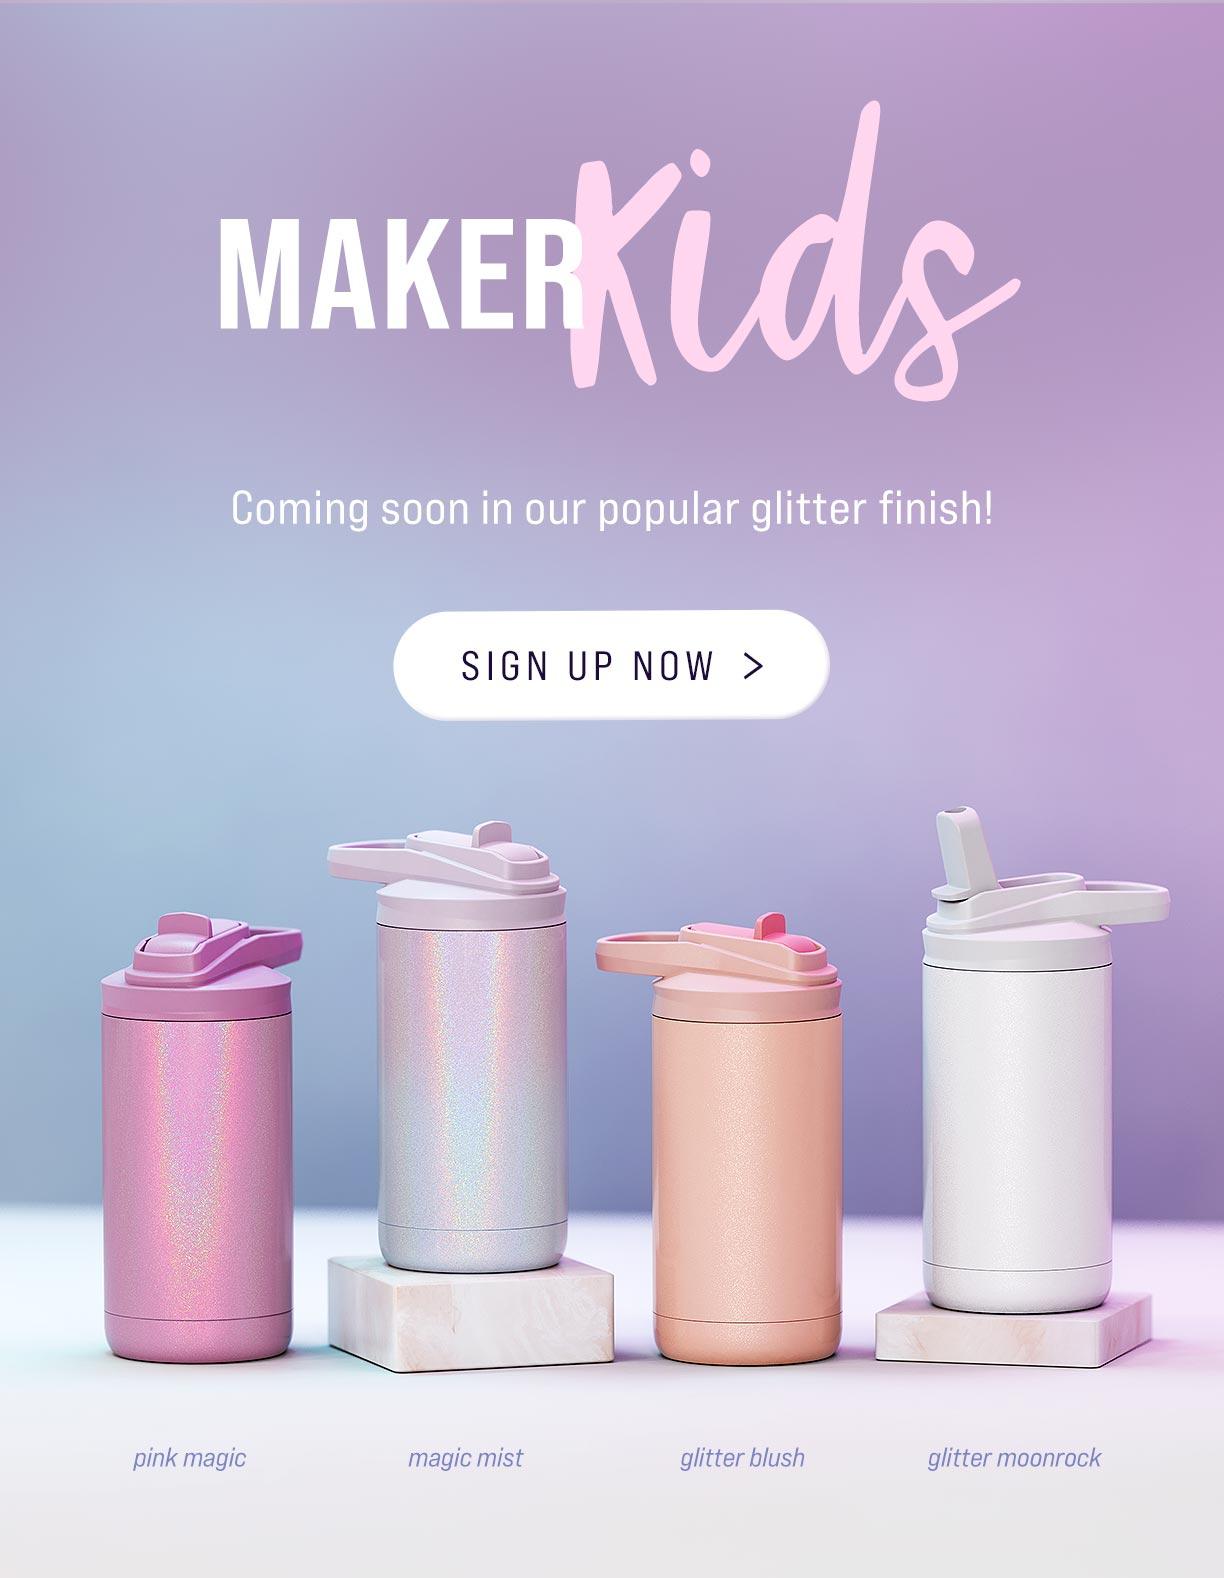 maker kids 12oz tumbler metal stainless steel glitter colors DIY cup sports bottle sip lid craft vinyl epoxy engrave bulk wholesale